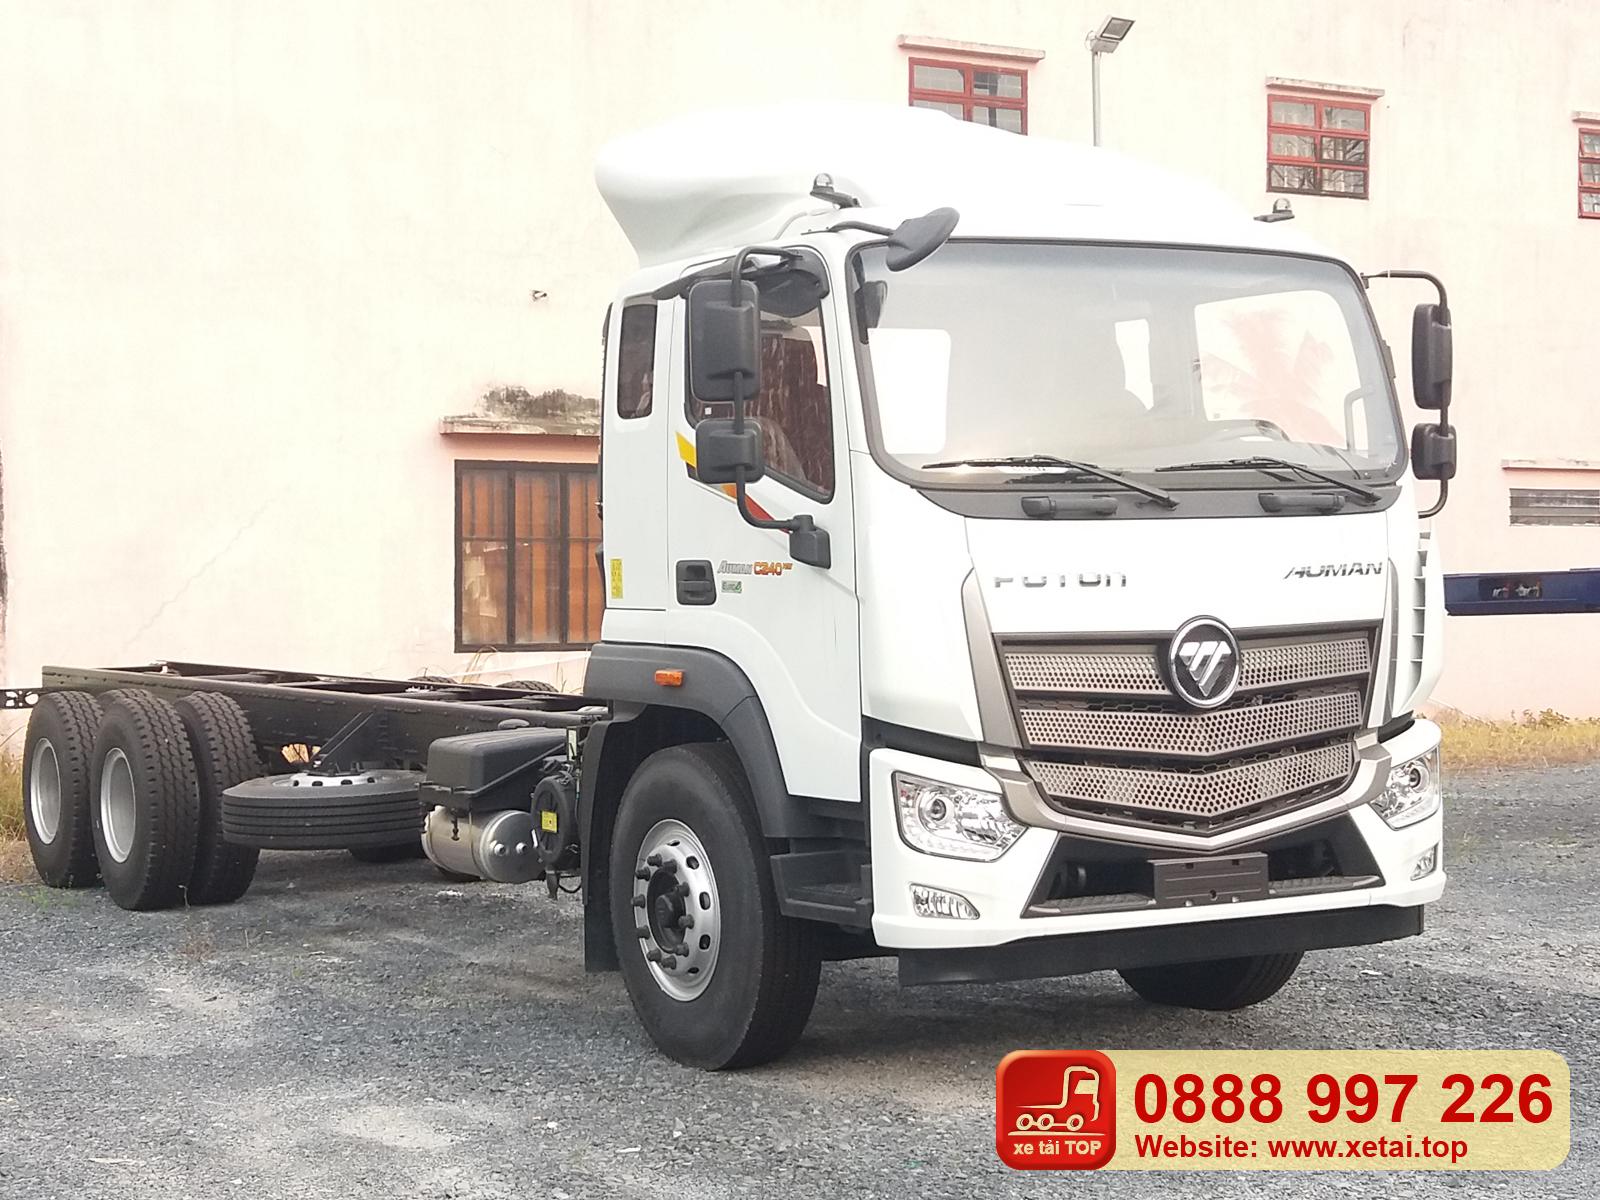 xe-tải-thaco-auman-c240-3-chân-thùng-dài